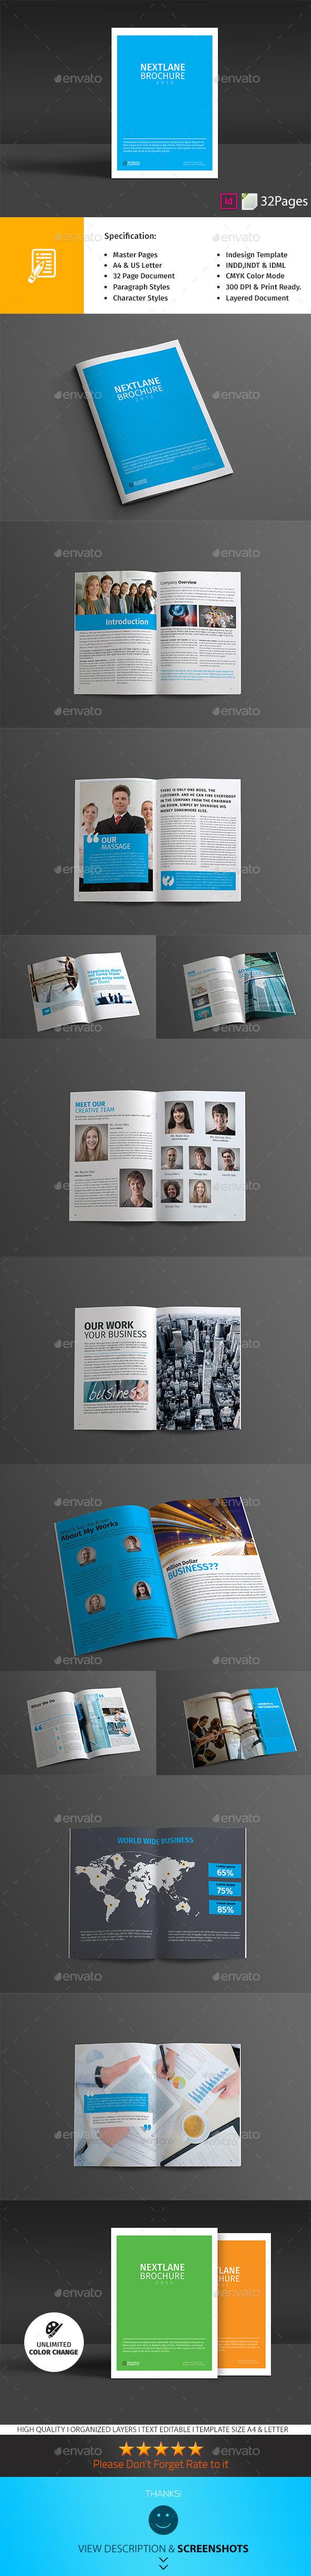 GraphicRiver Nextlane Brochure 9748316